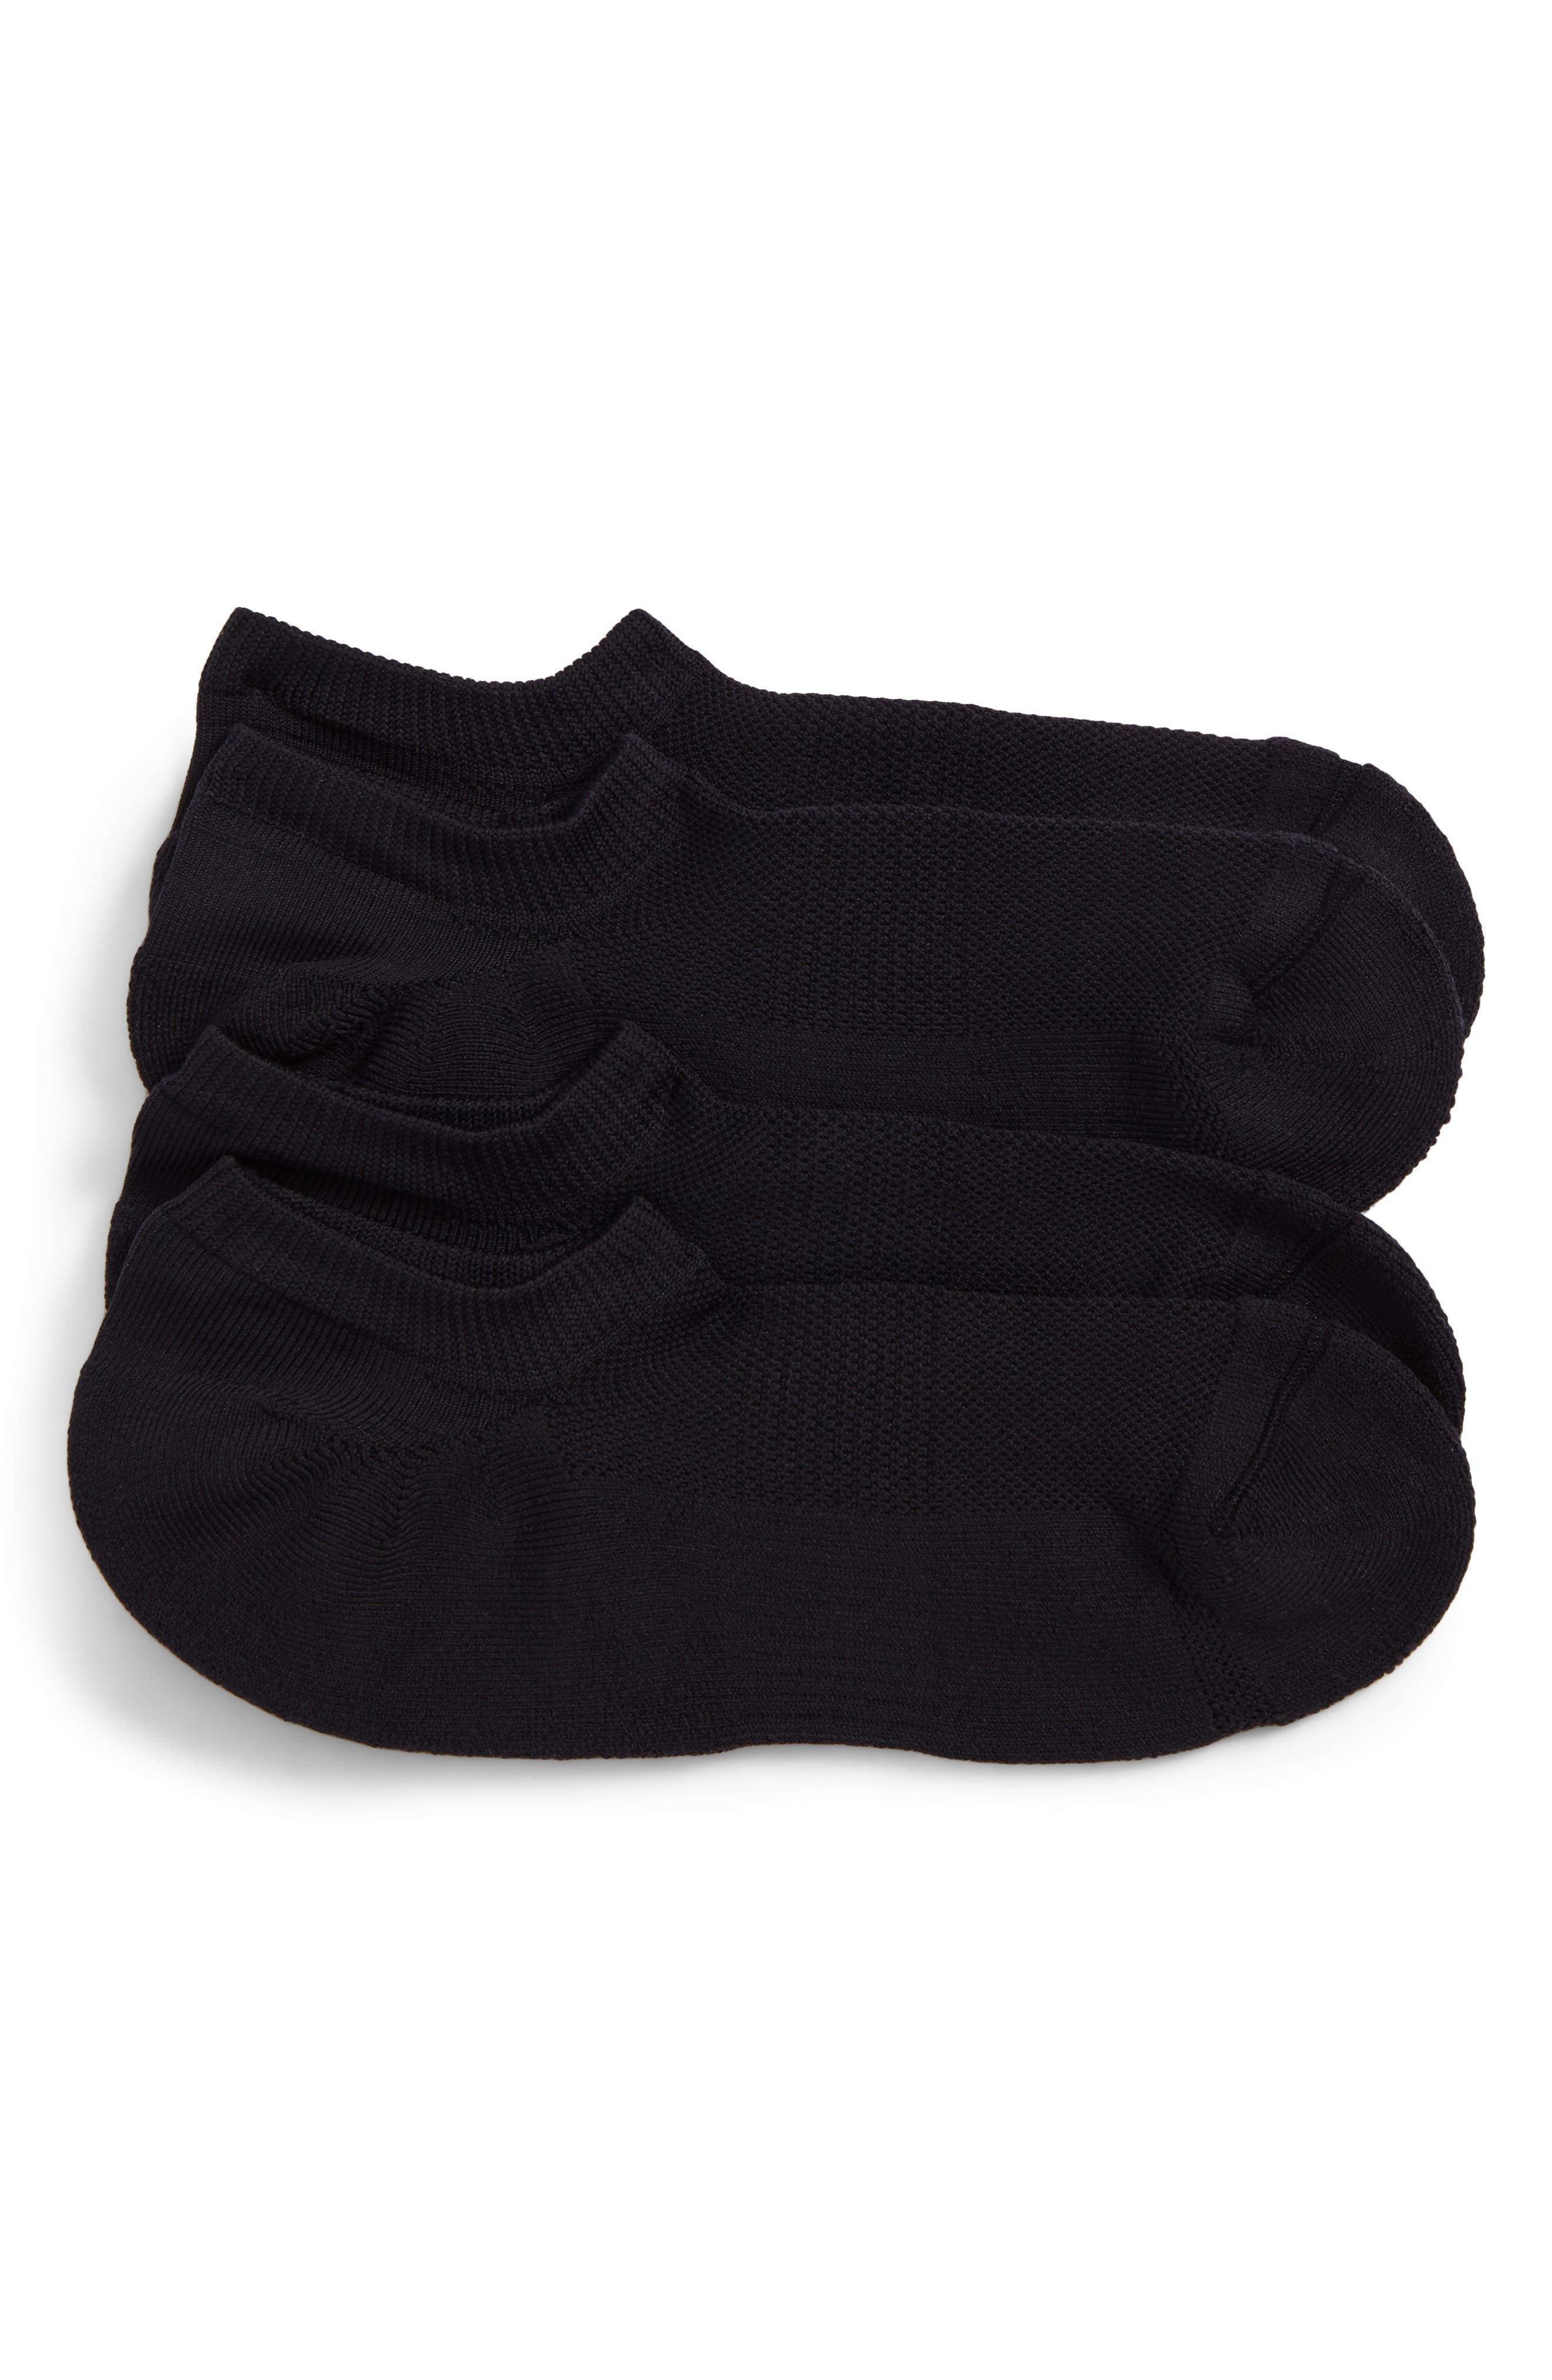 Tech-Smart 2-Pack No-Show Socks,                             Main thumbnail 1, color,